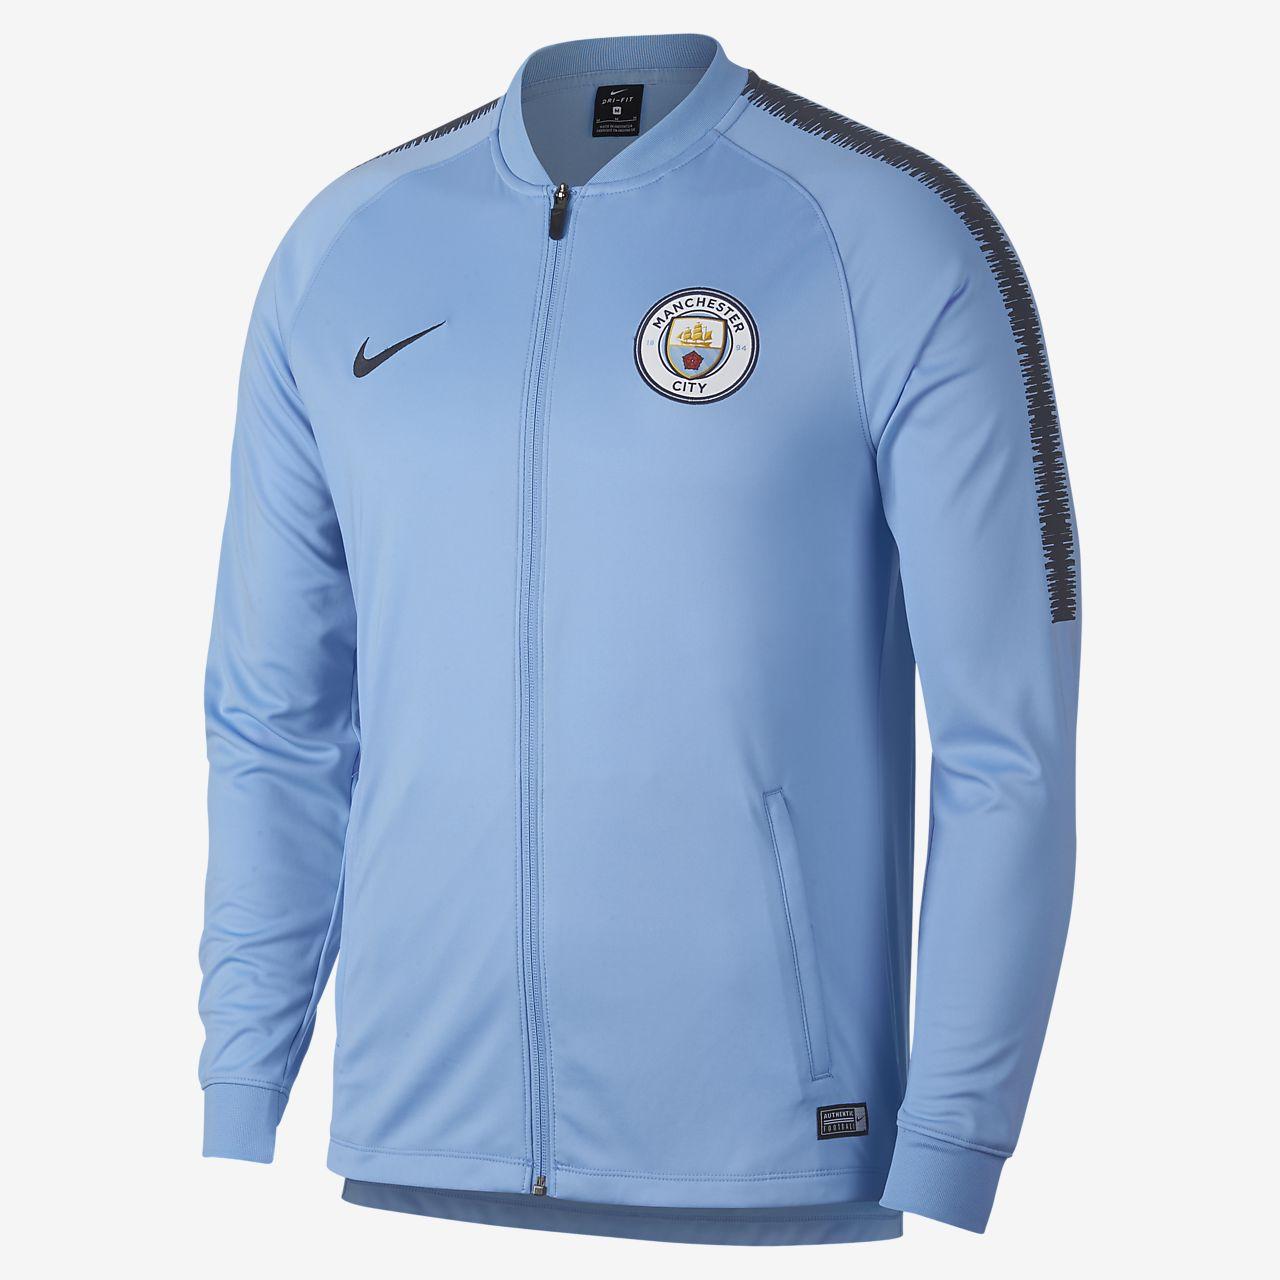 Veste Manchester De Squad Survêtement Dri Fit City Football Fc O6F4waq